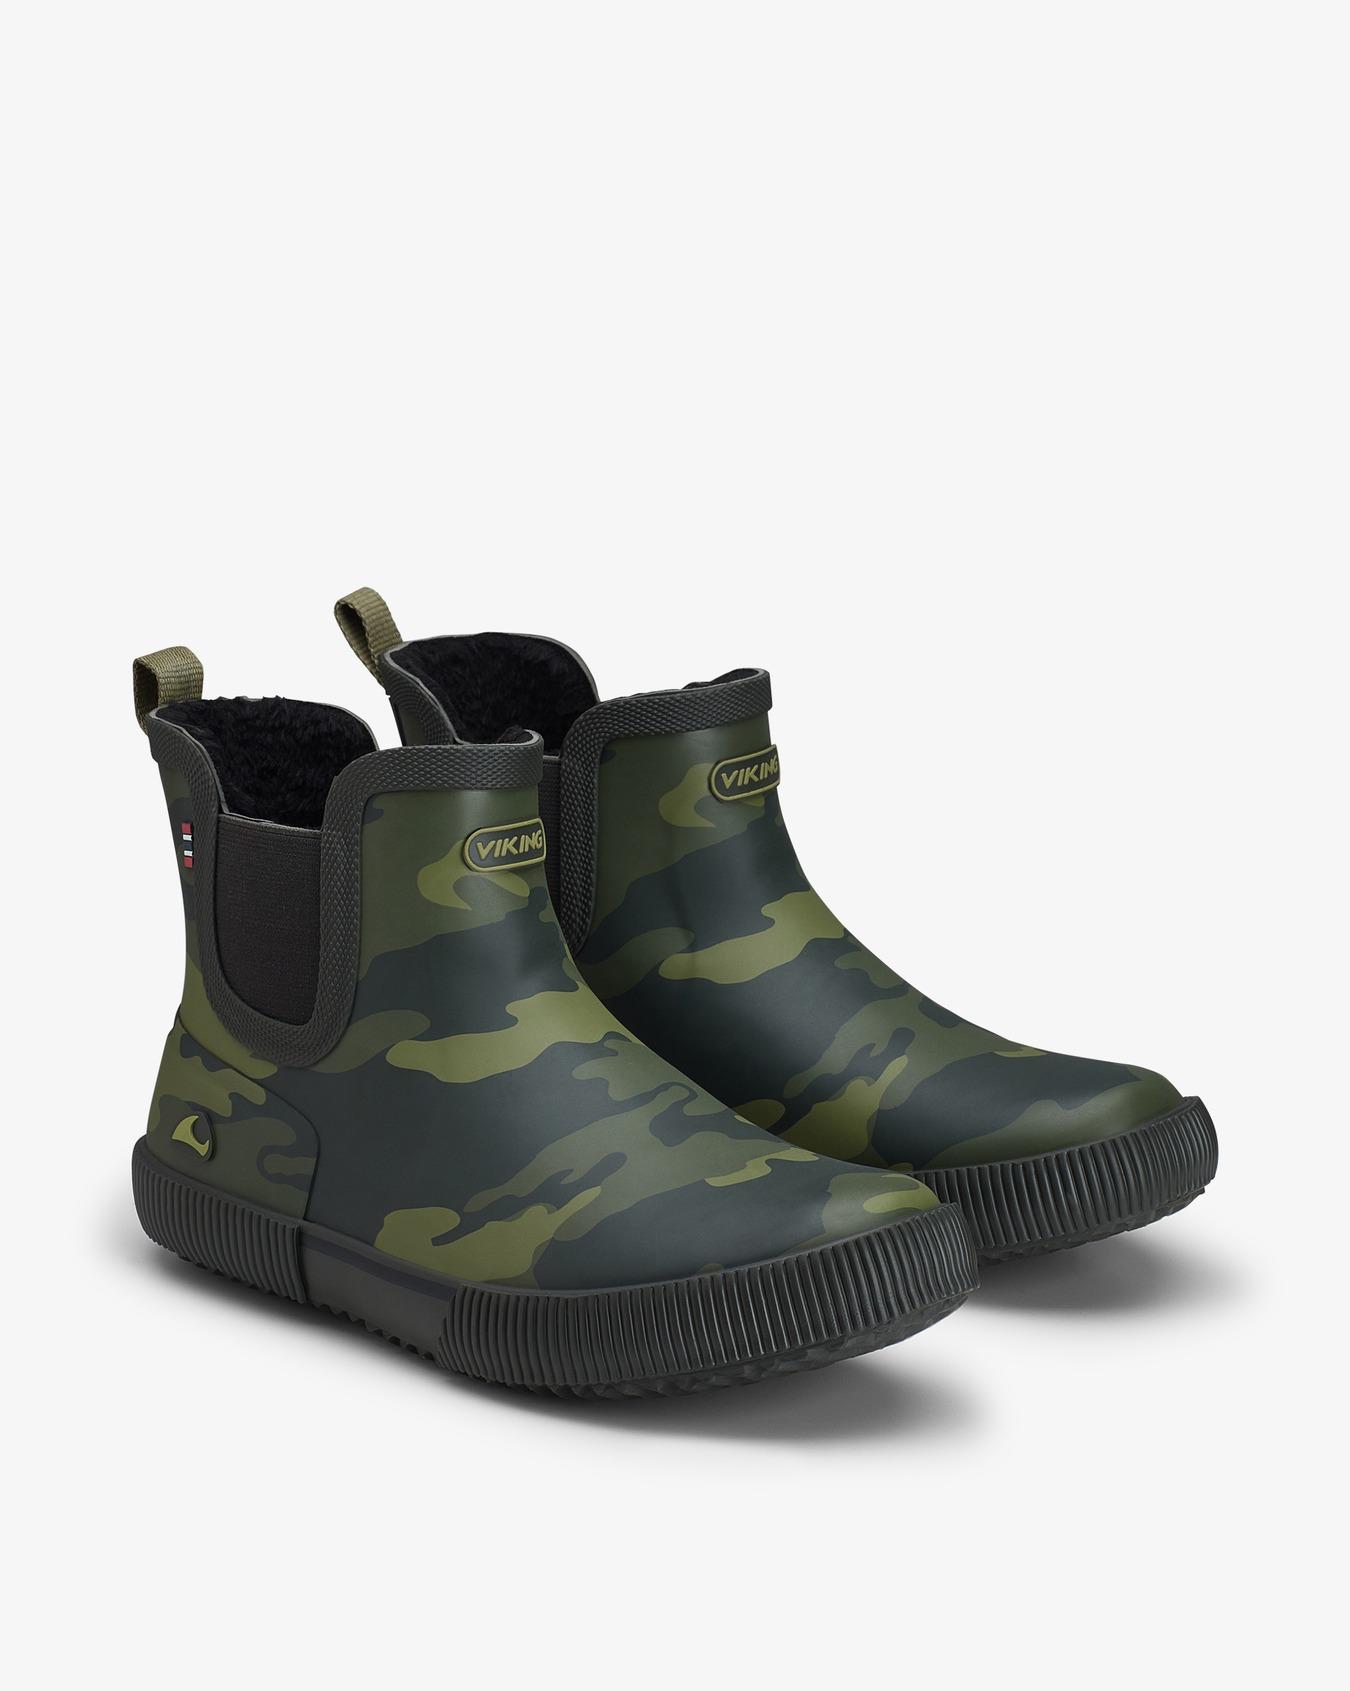 Stavern Urban Winter Rubber Boots